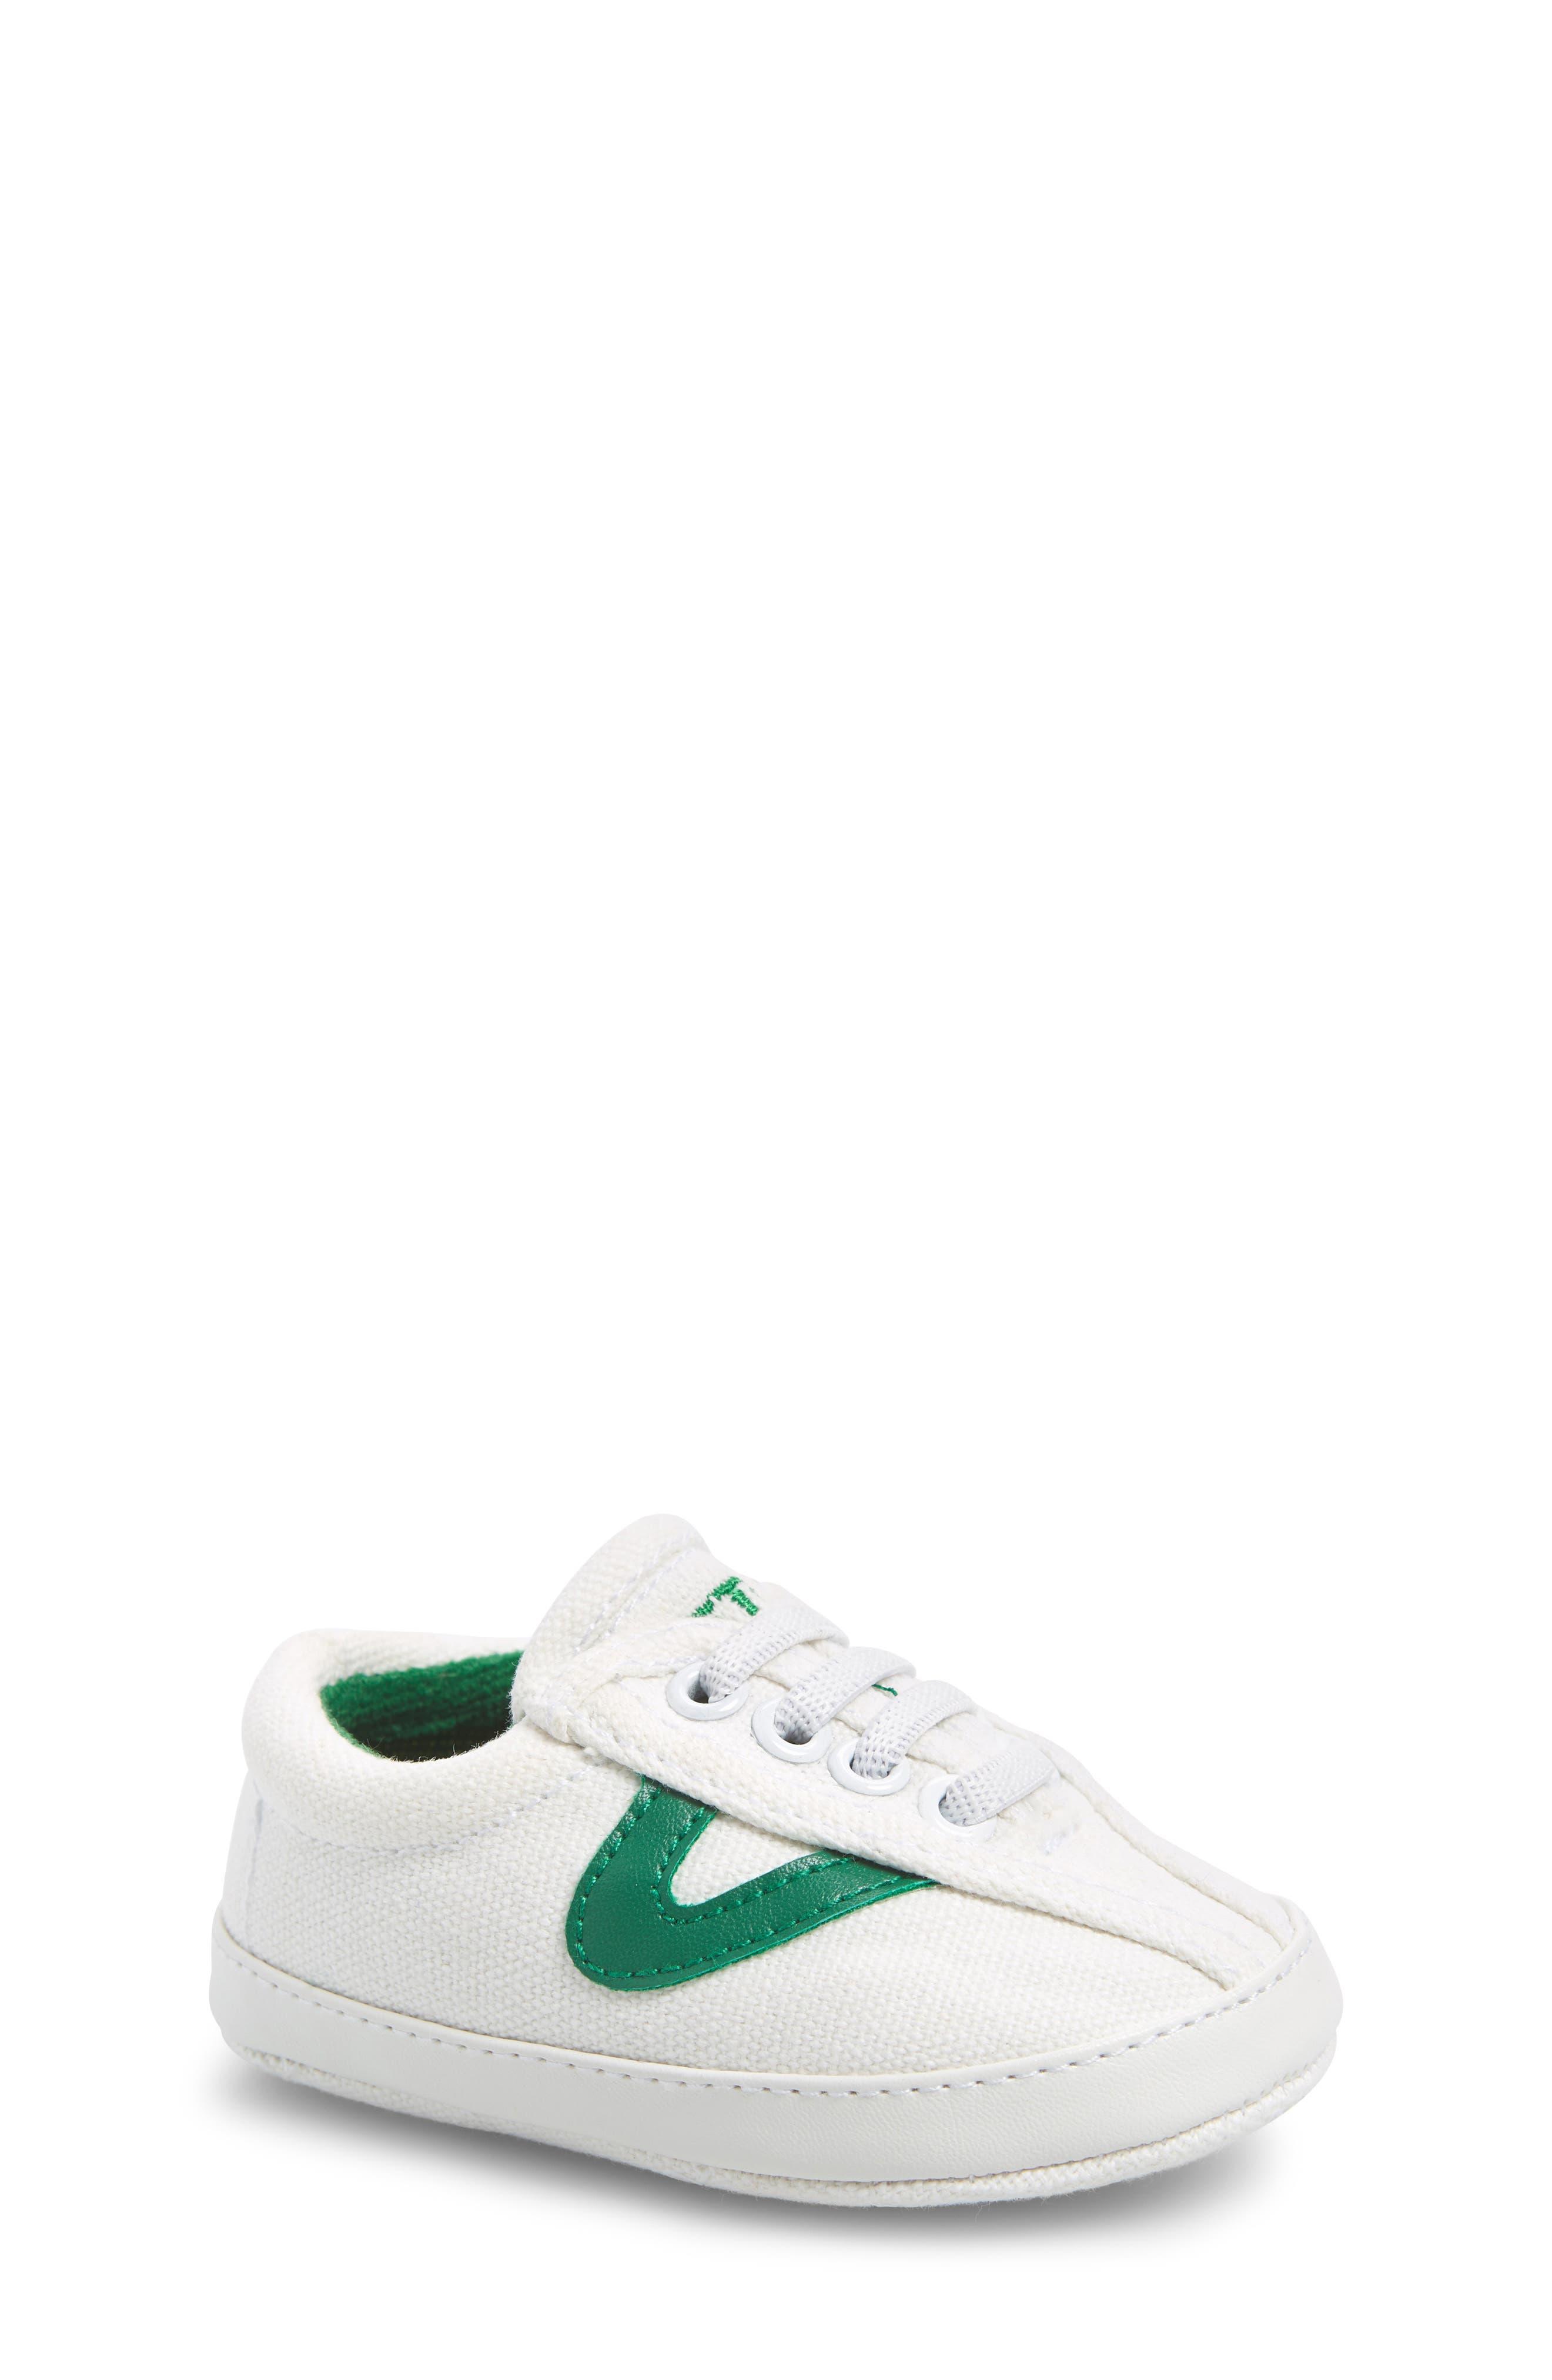 Nylite Plus Sneaker,                             Main thumbnail 1, color,                             White/ Green